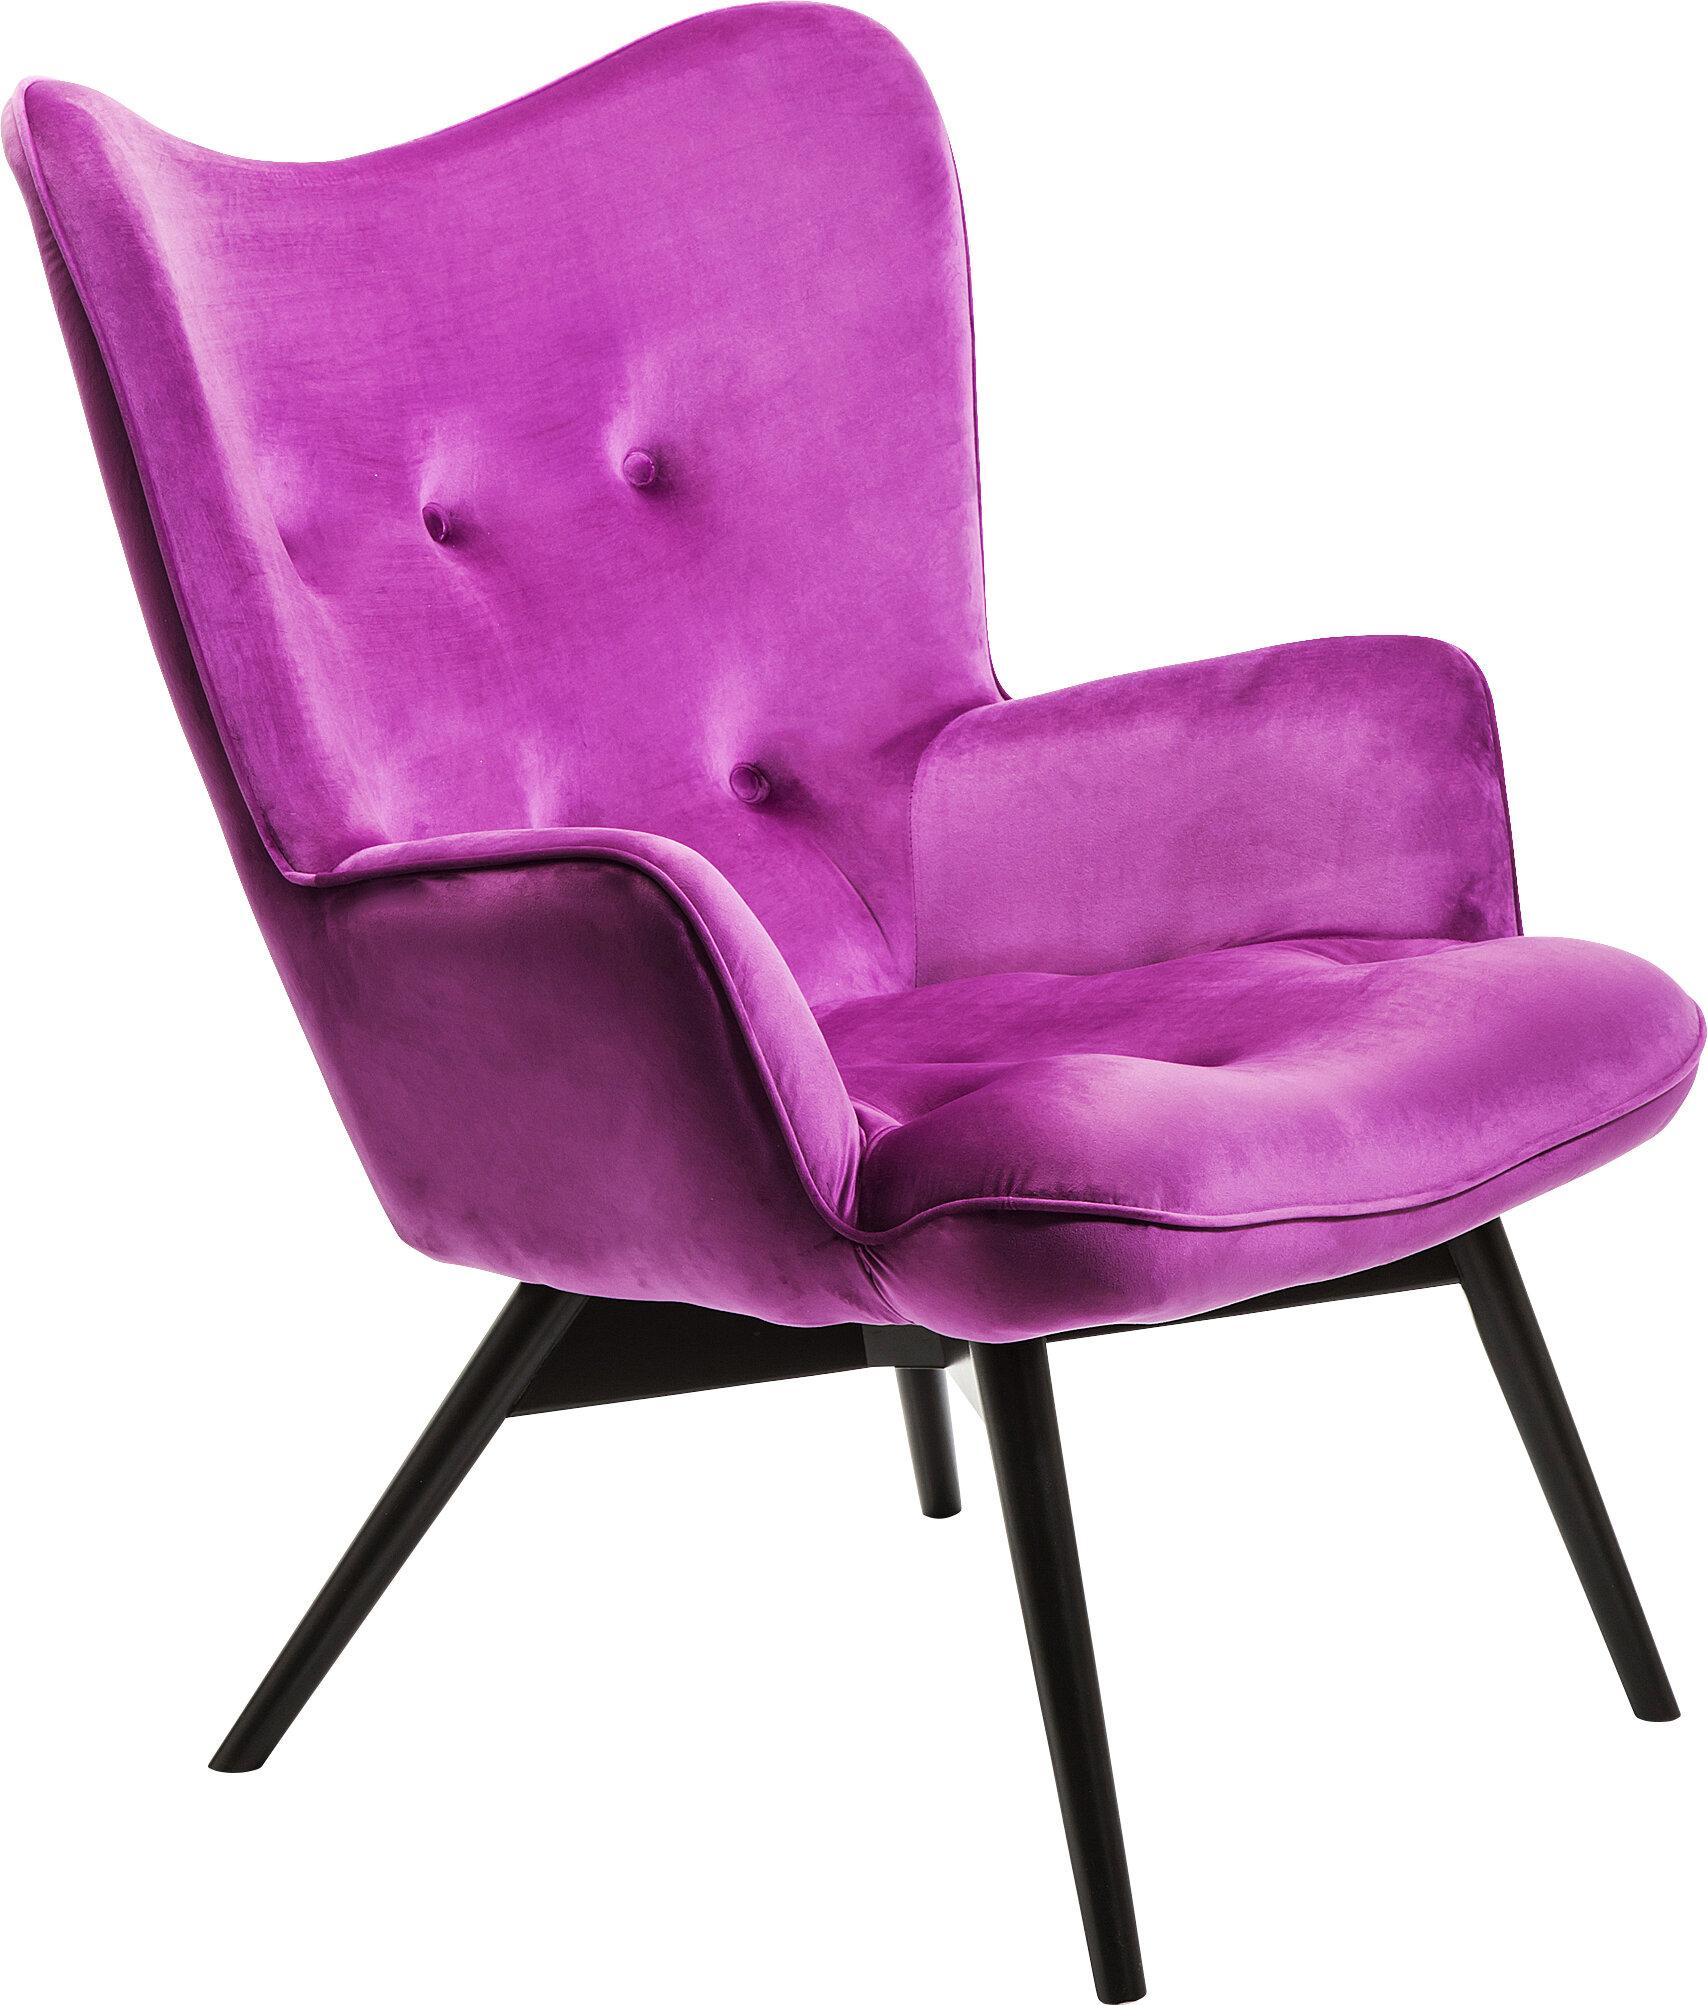 Kare Design Sessel Vicky Wayfair De